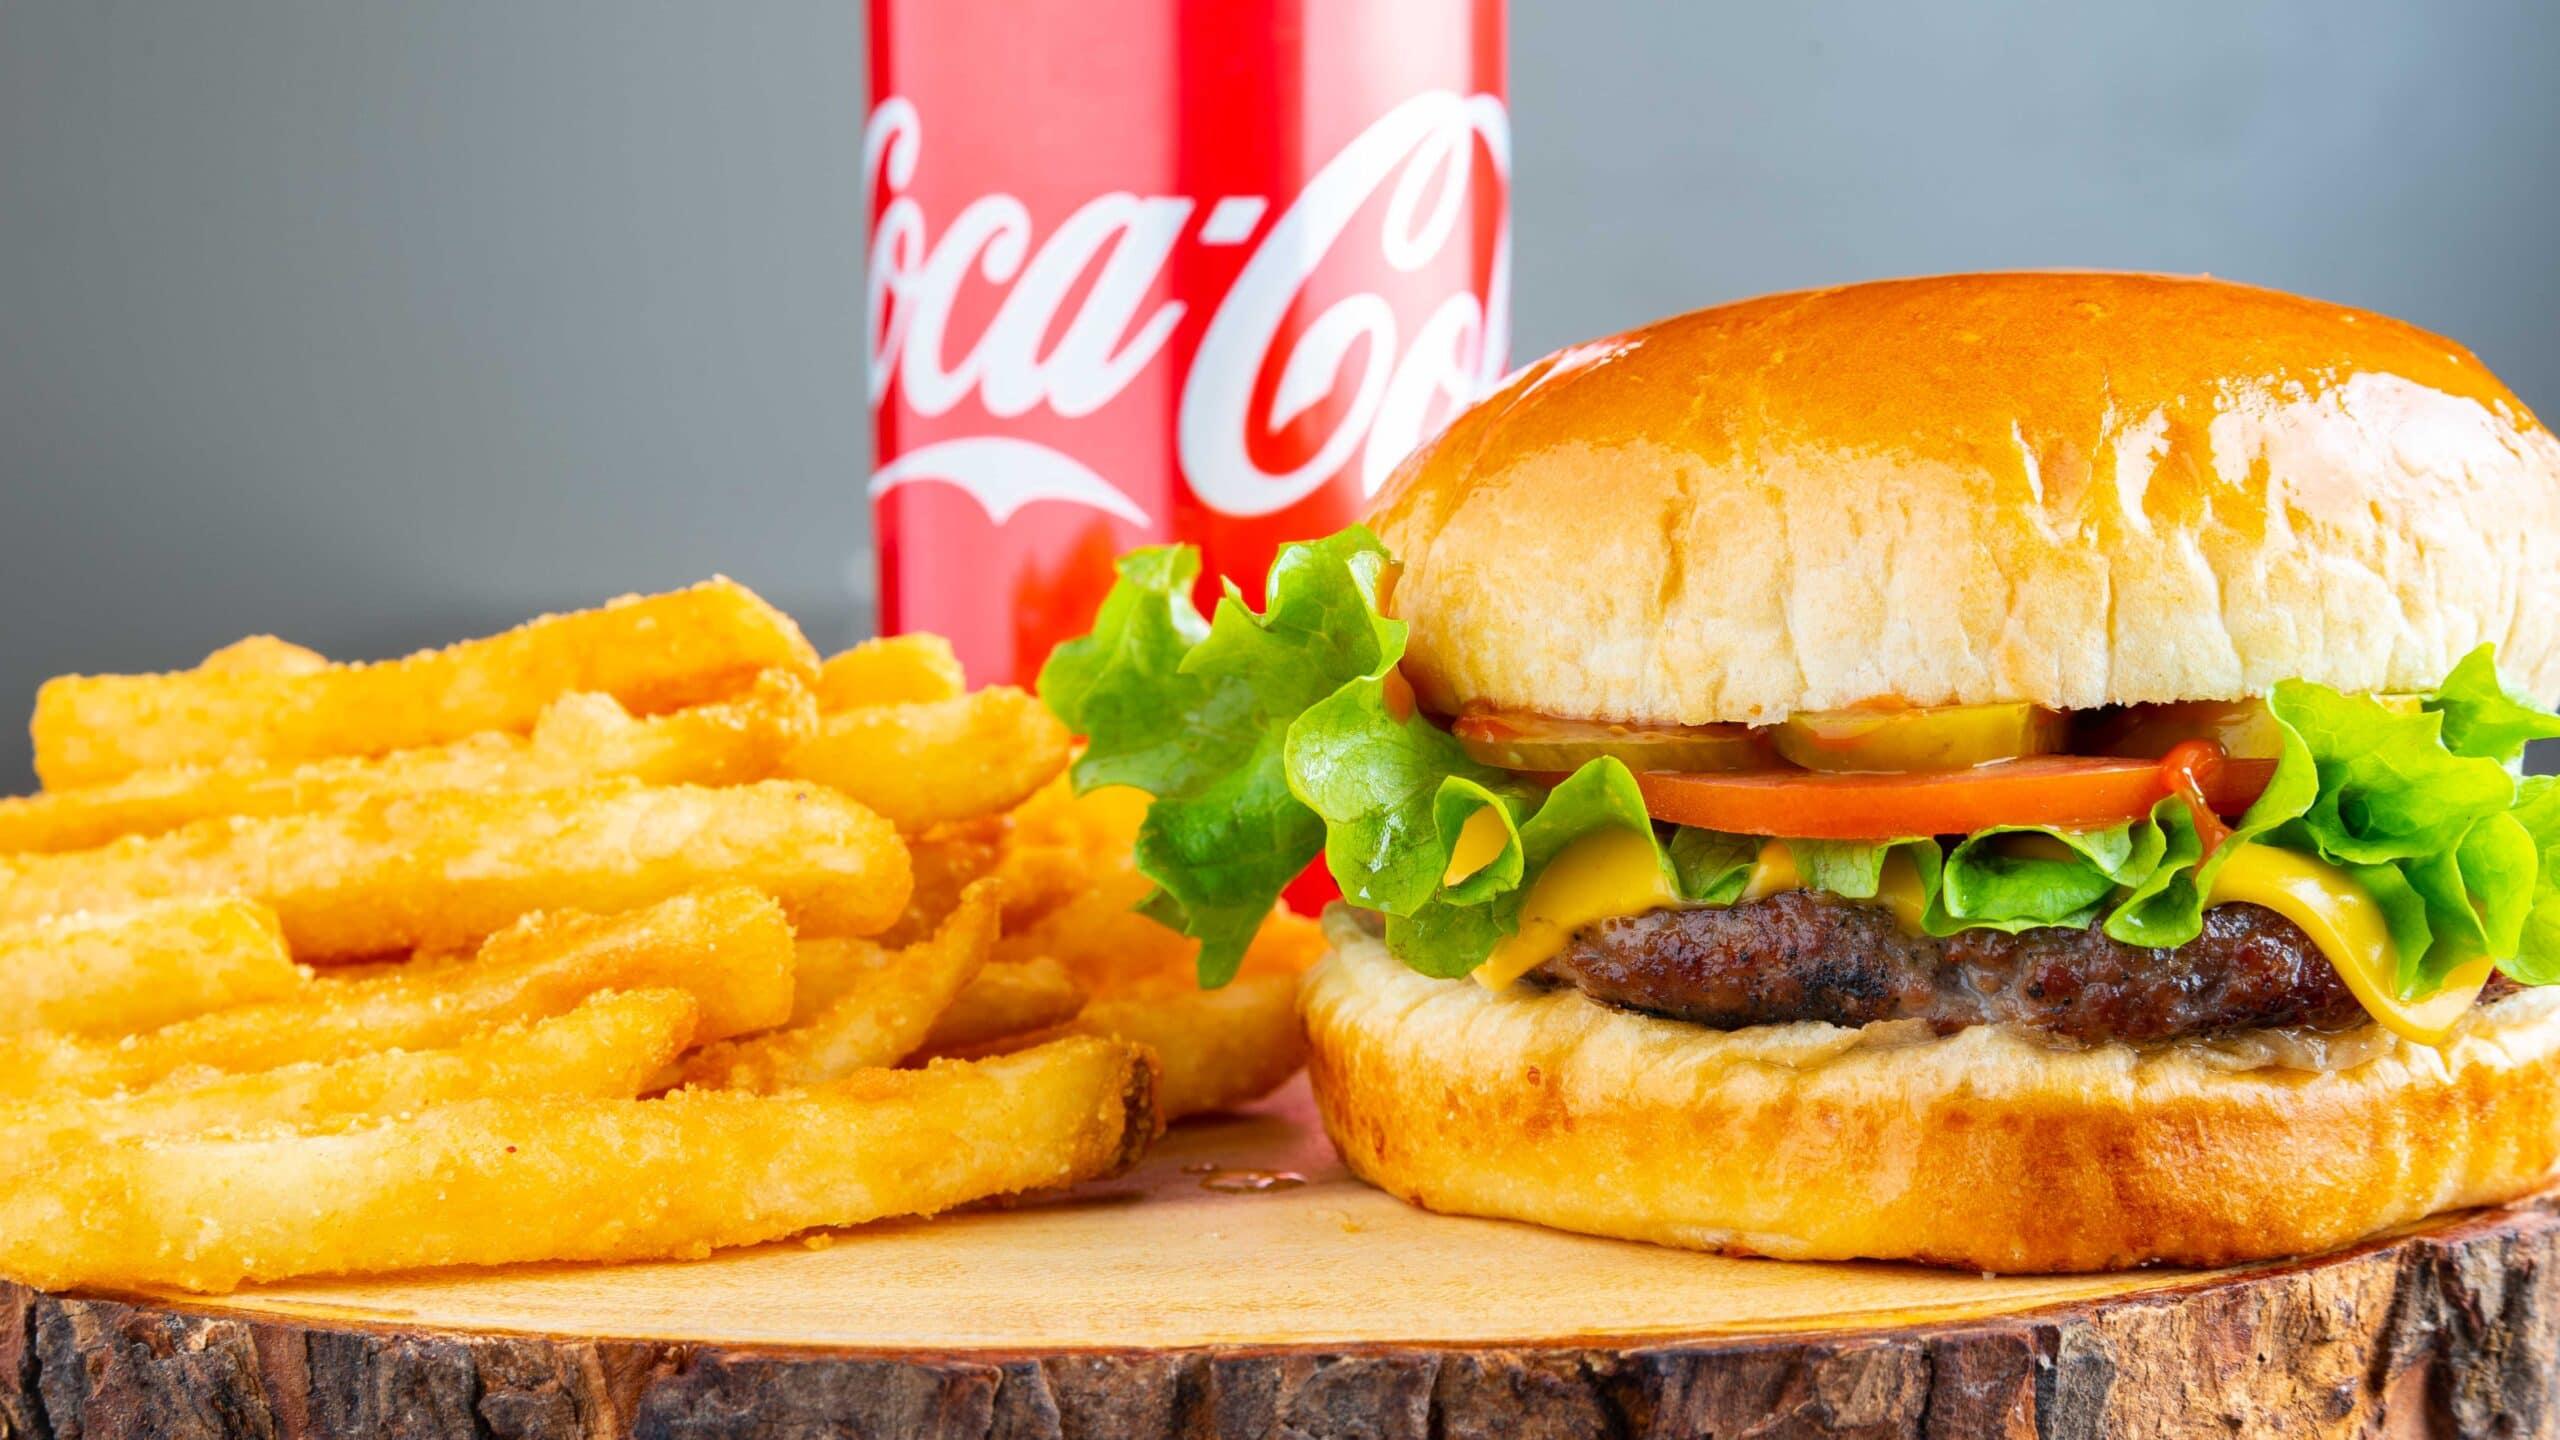 Arabic Style Cheeseburger